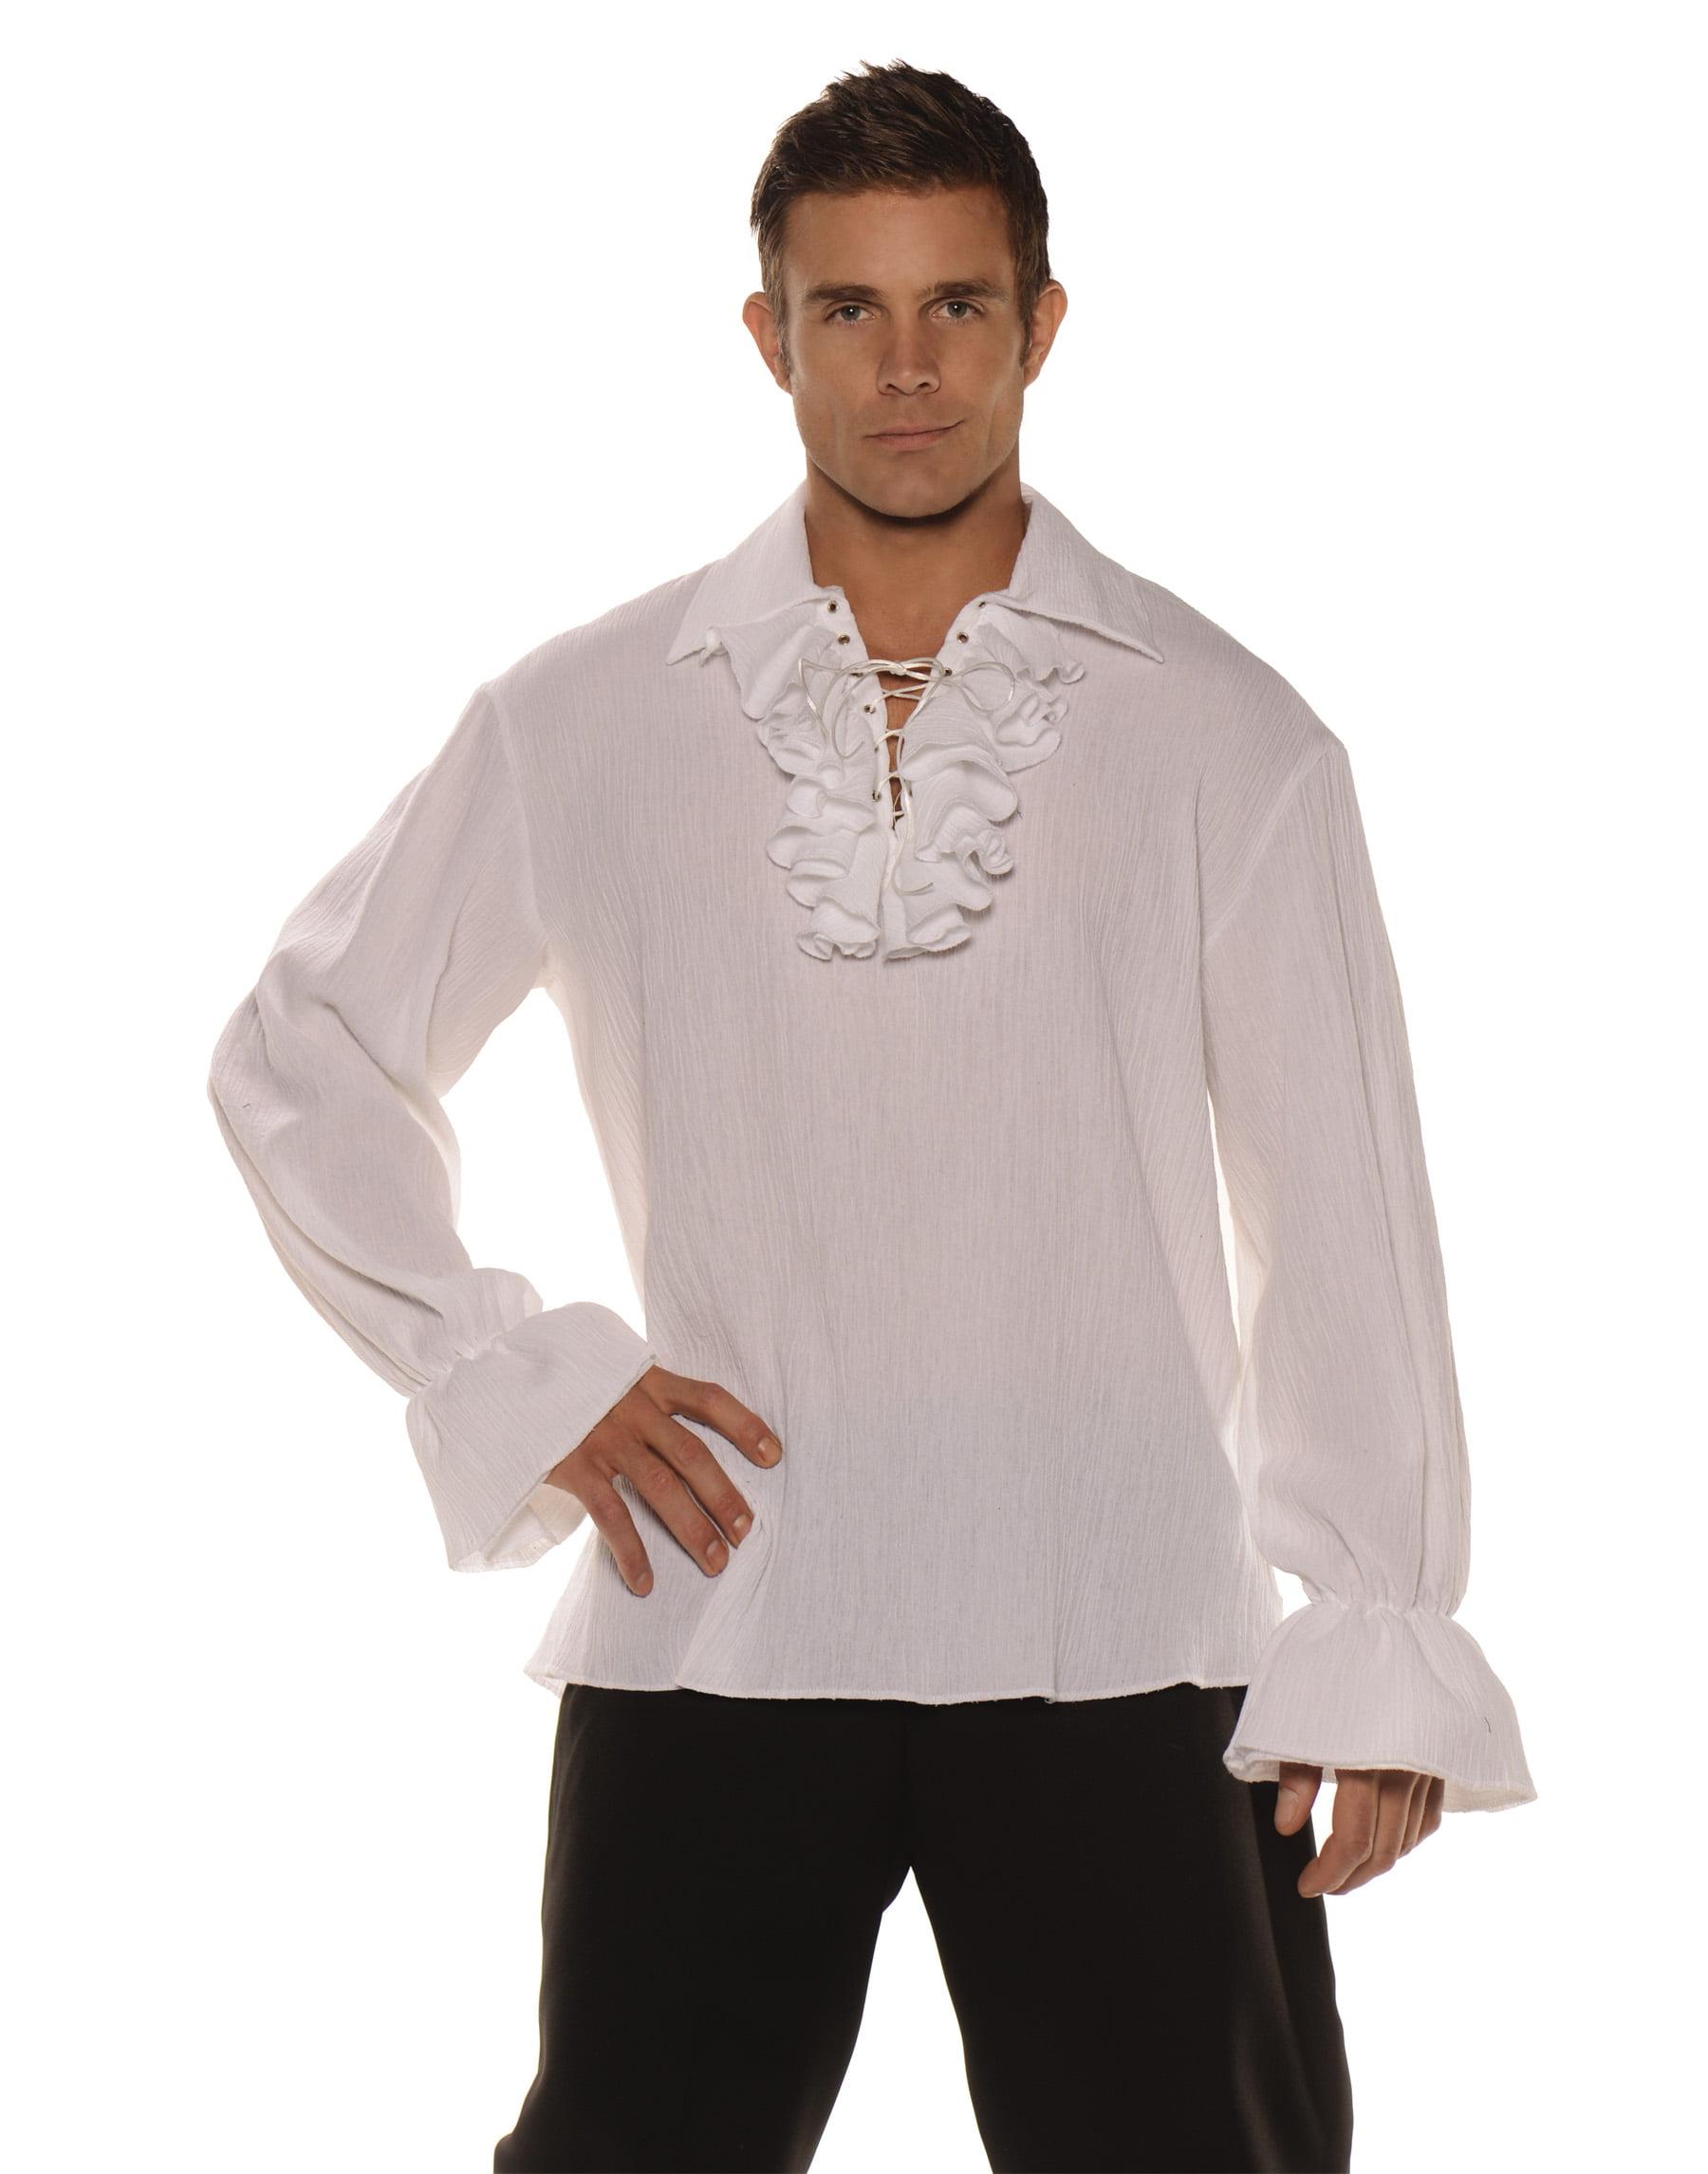 Adult Male Pirate Shirt White